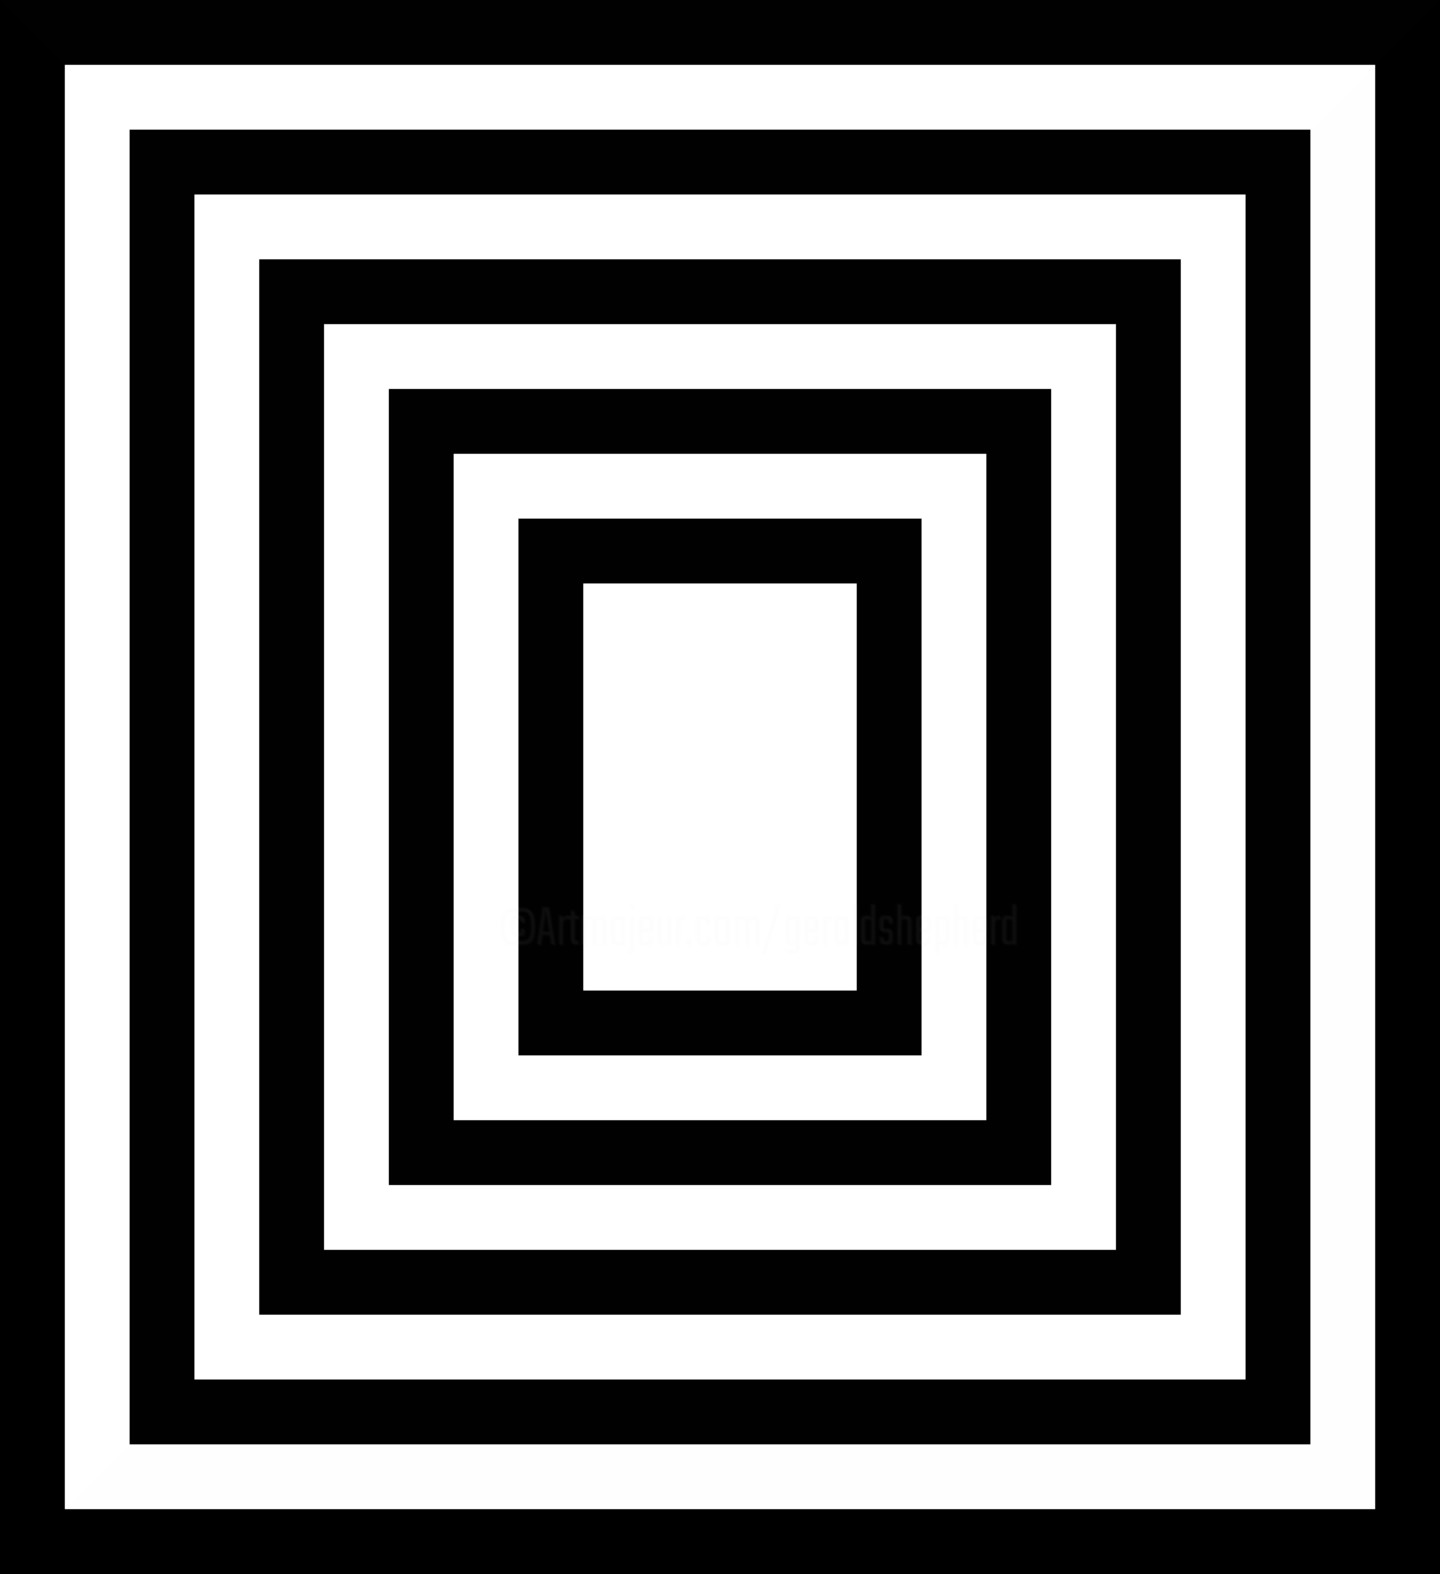 Gerald Shepherd - Borders (Black And White)